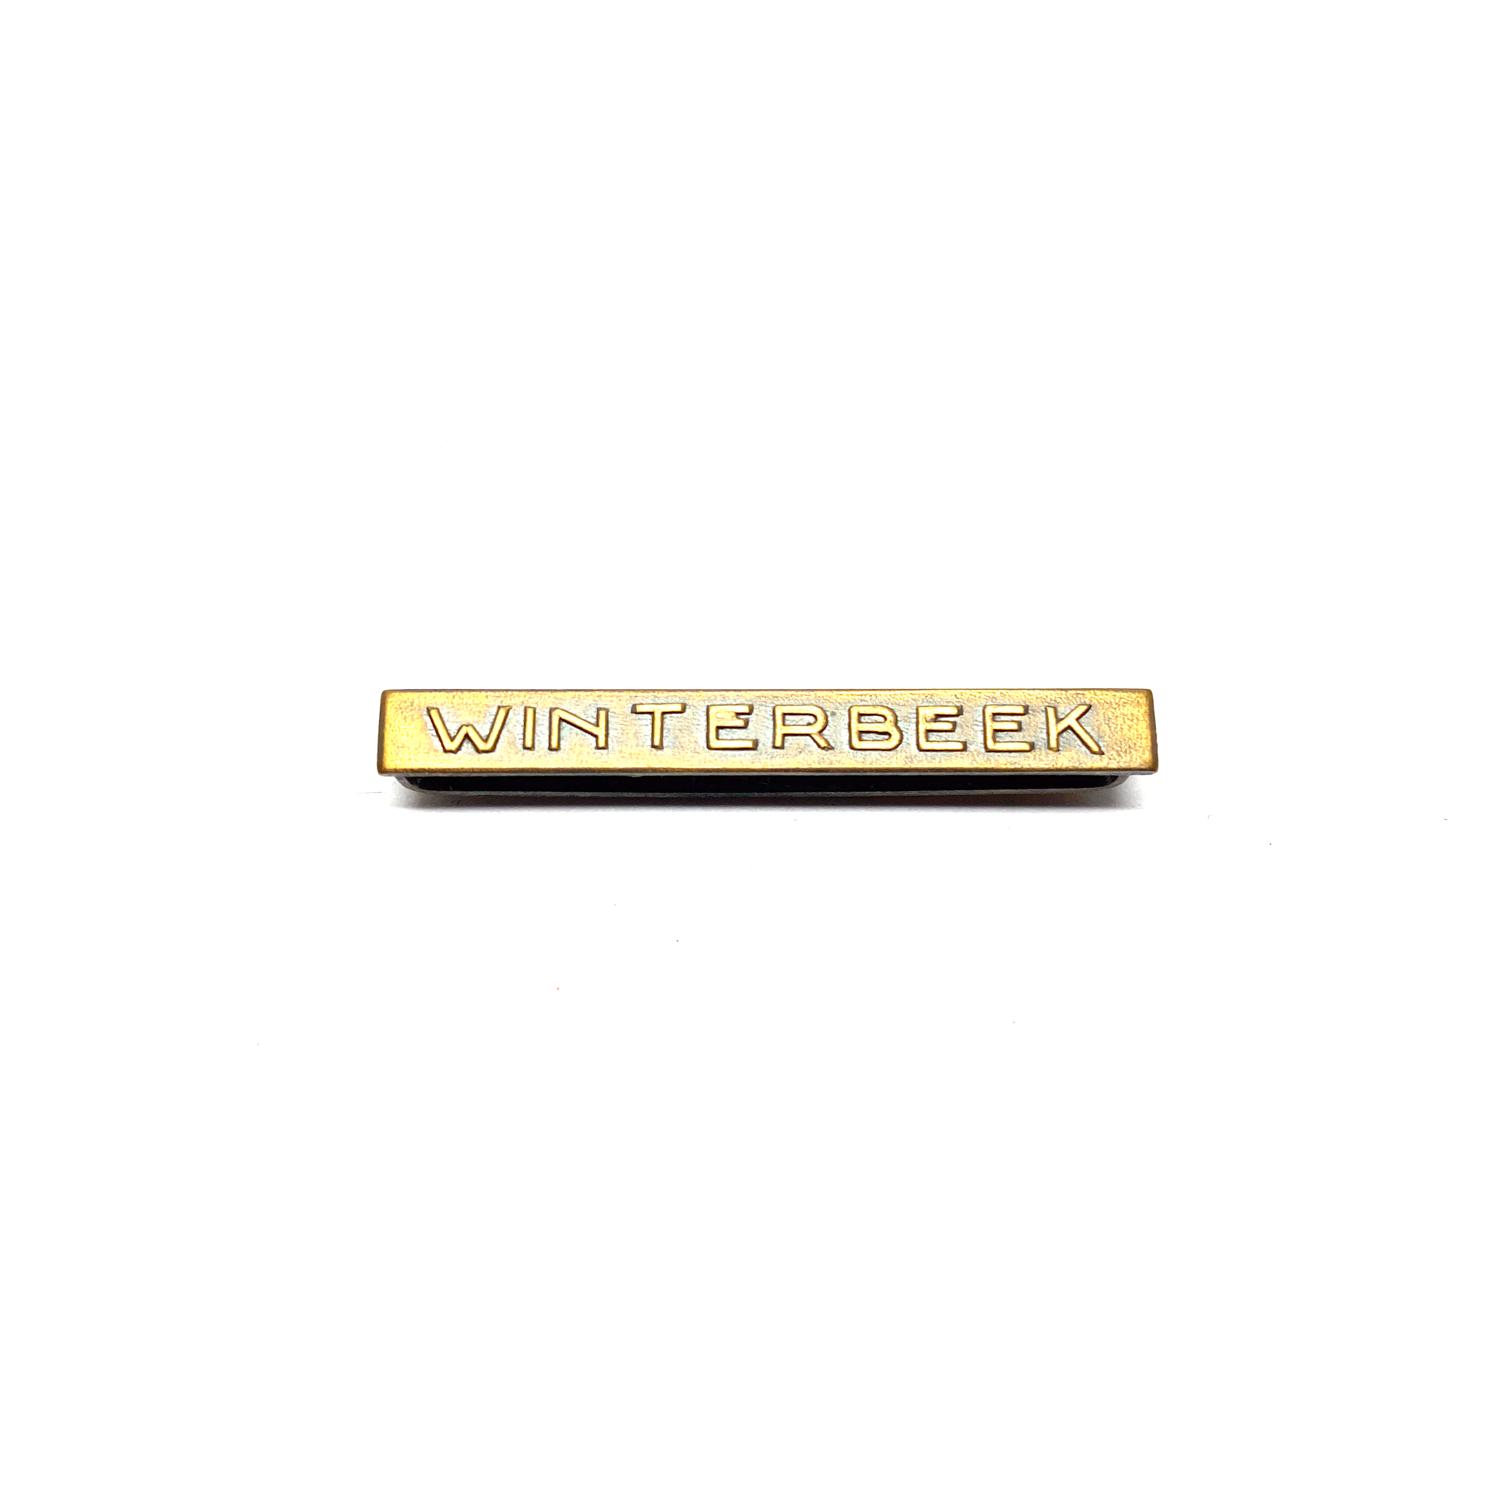 Bar Winterbeek for war medals